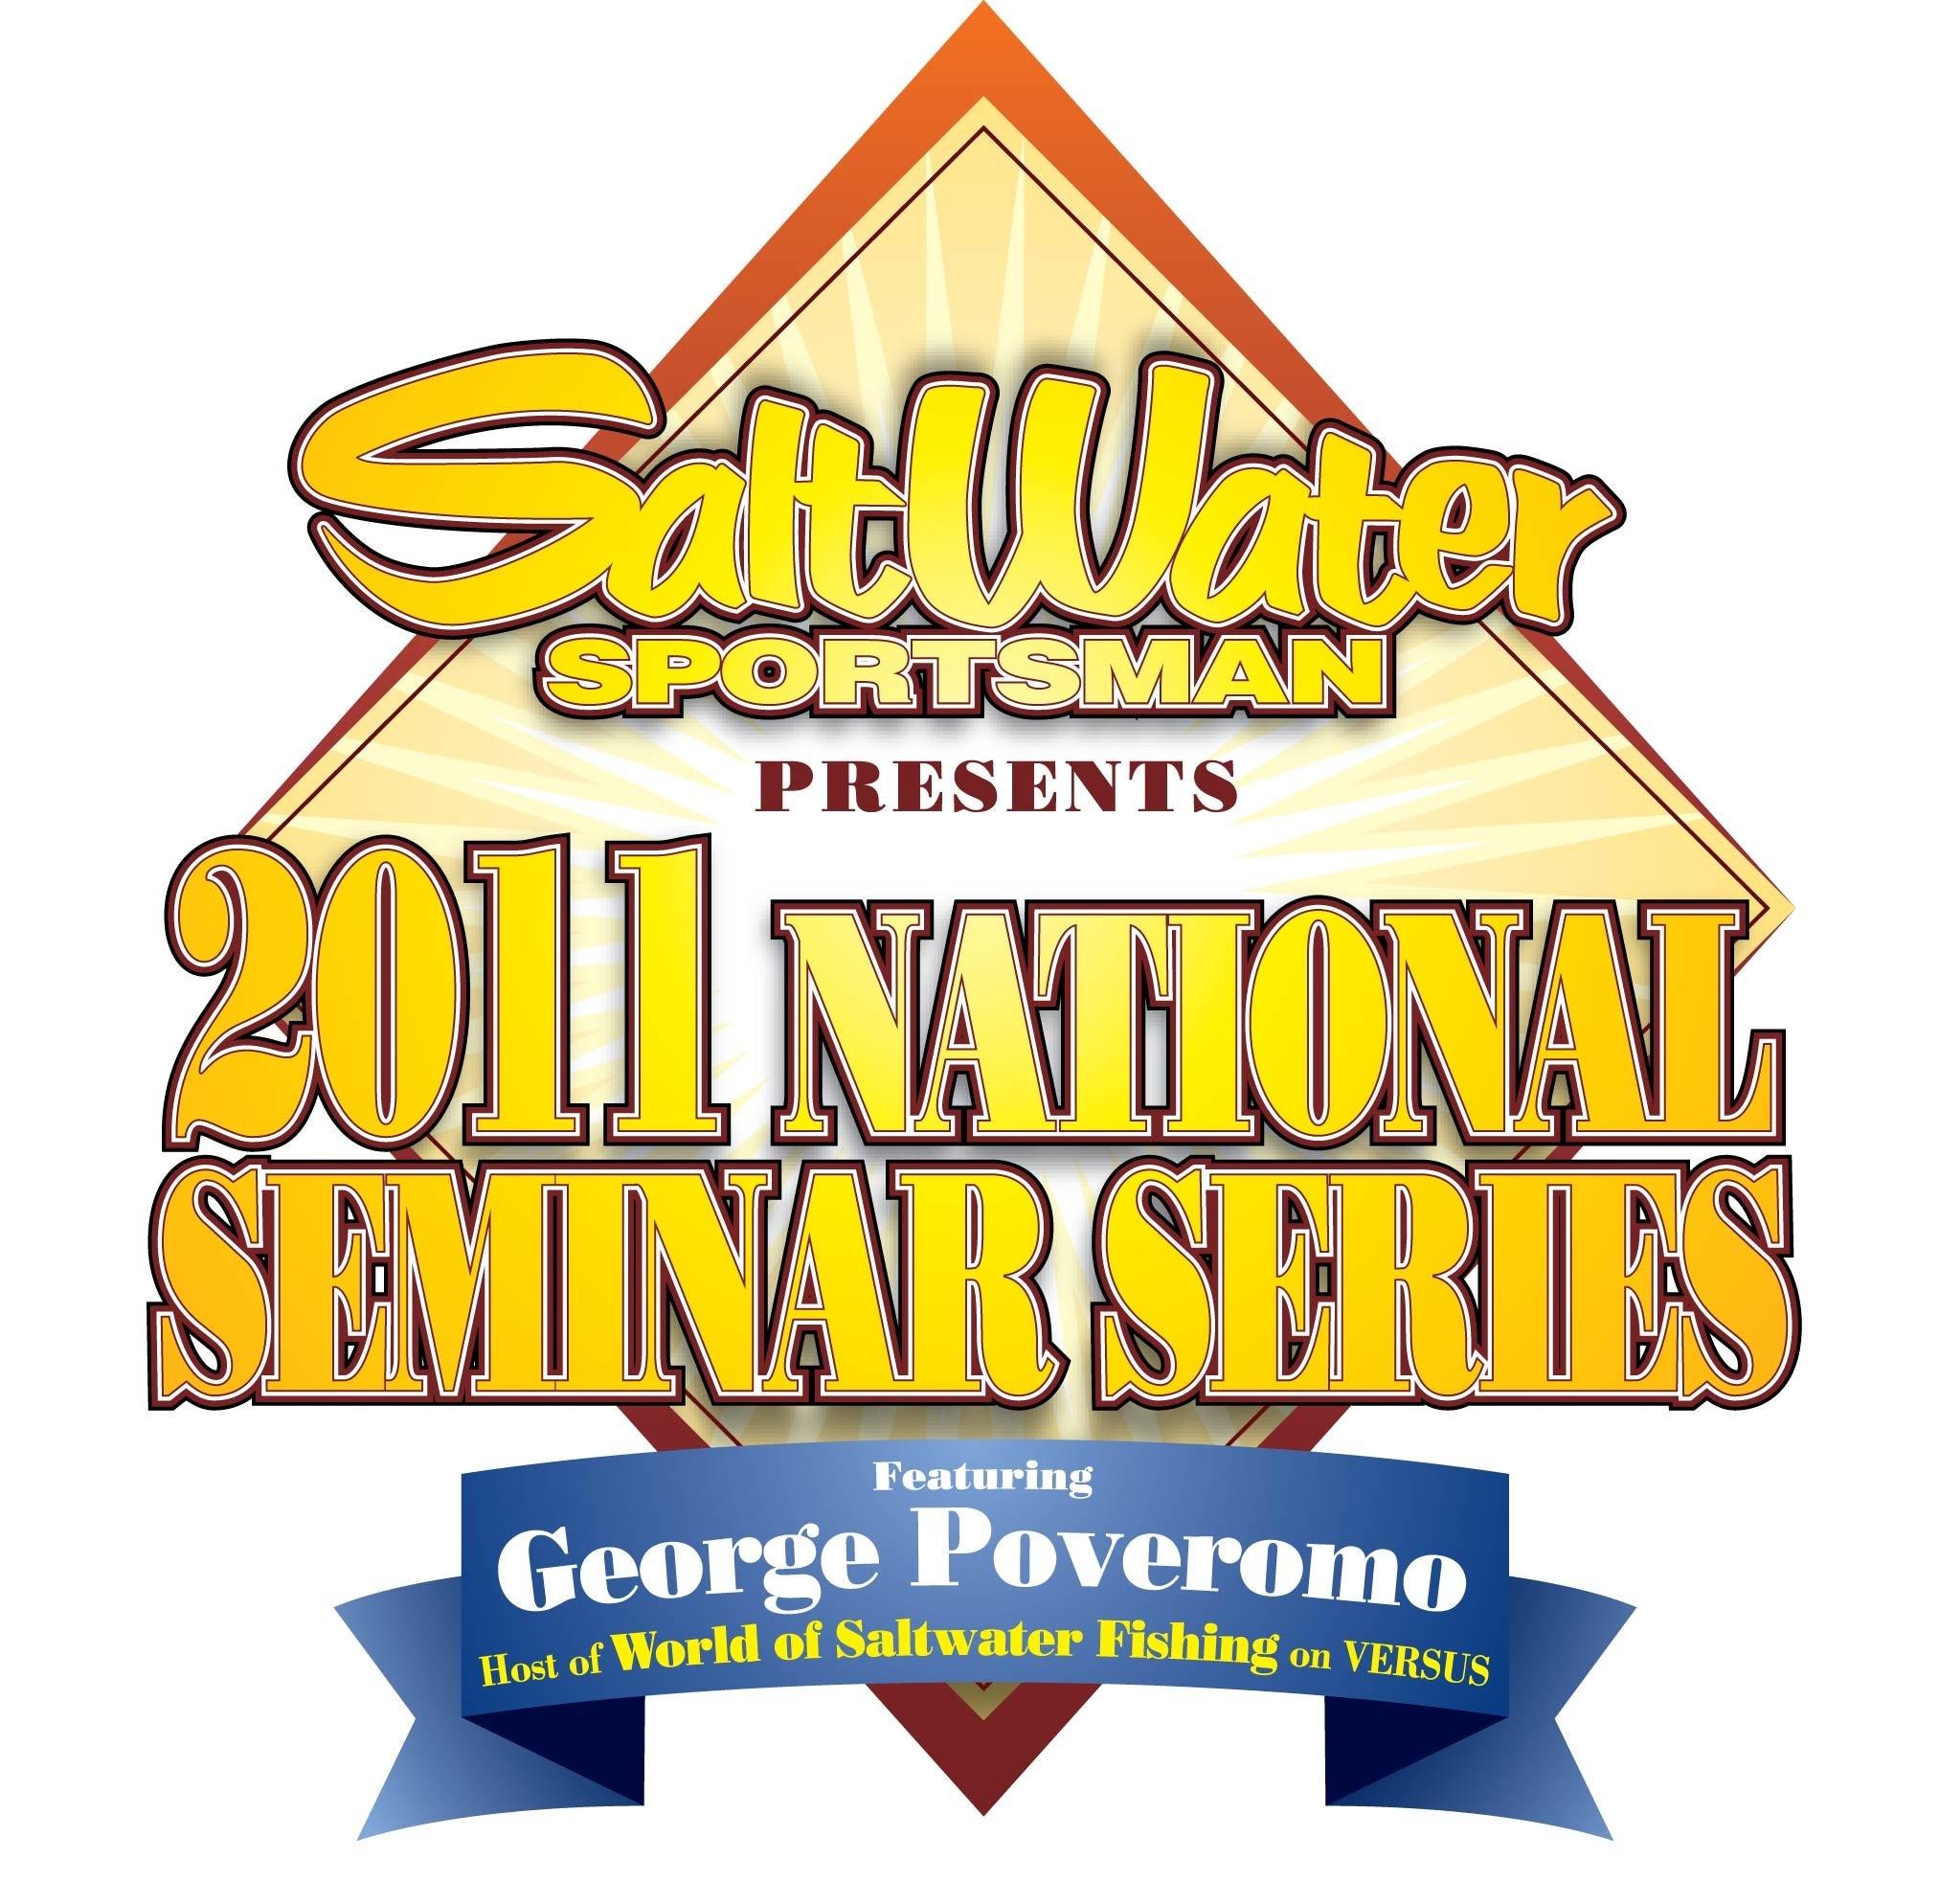 Salt Water Seminars